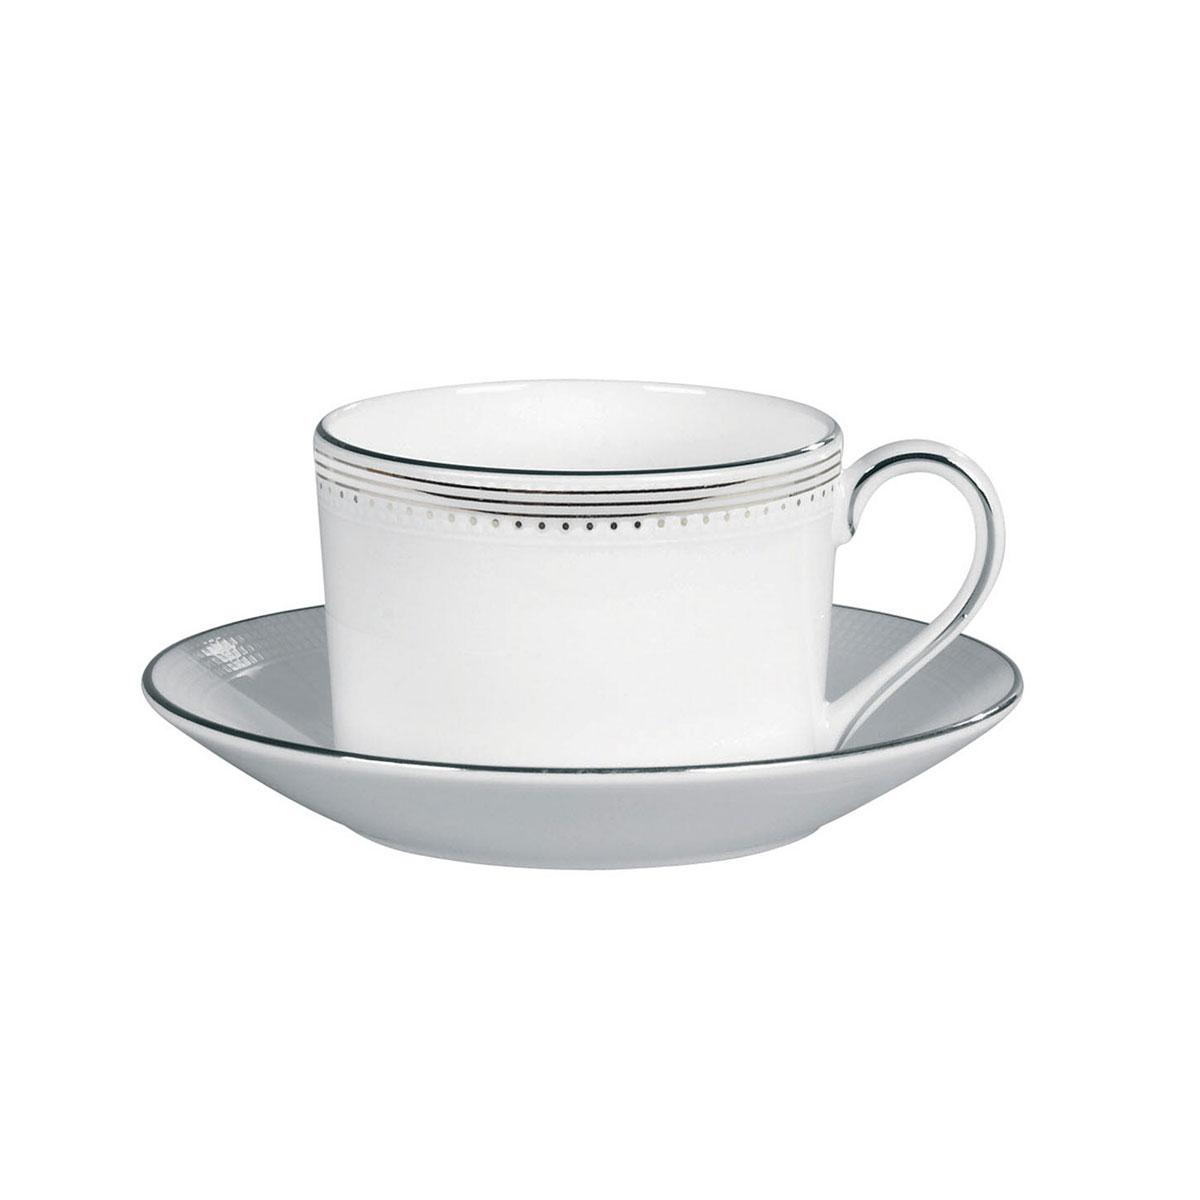 Vera Wang Wedgwood Grosgrain Teacup and Saucer